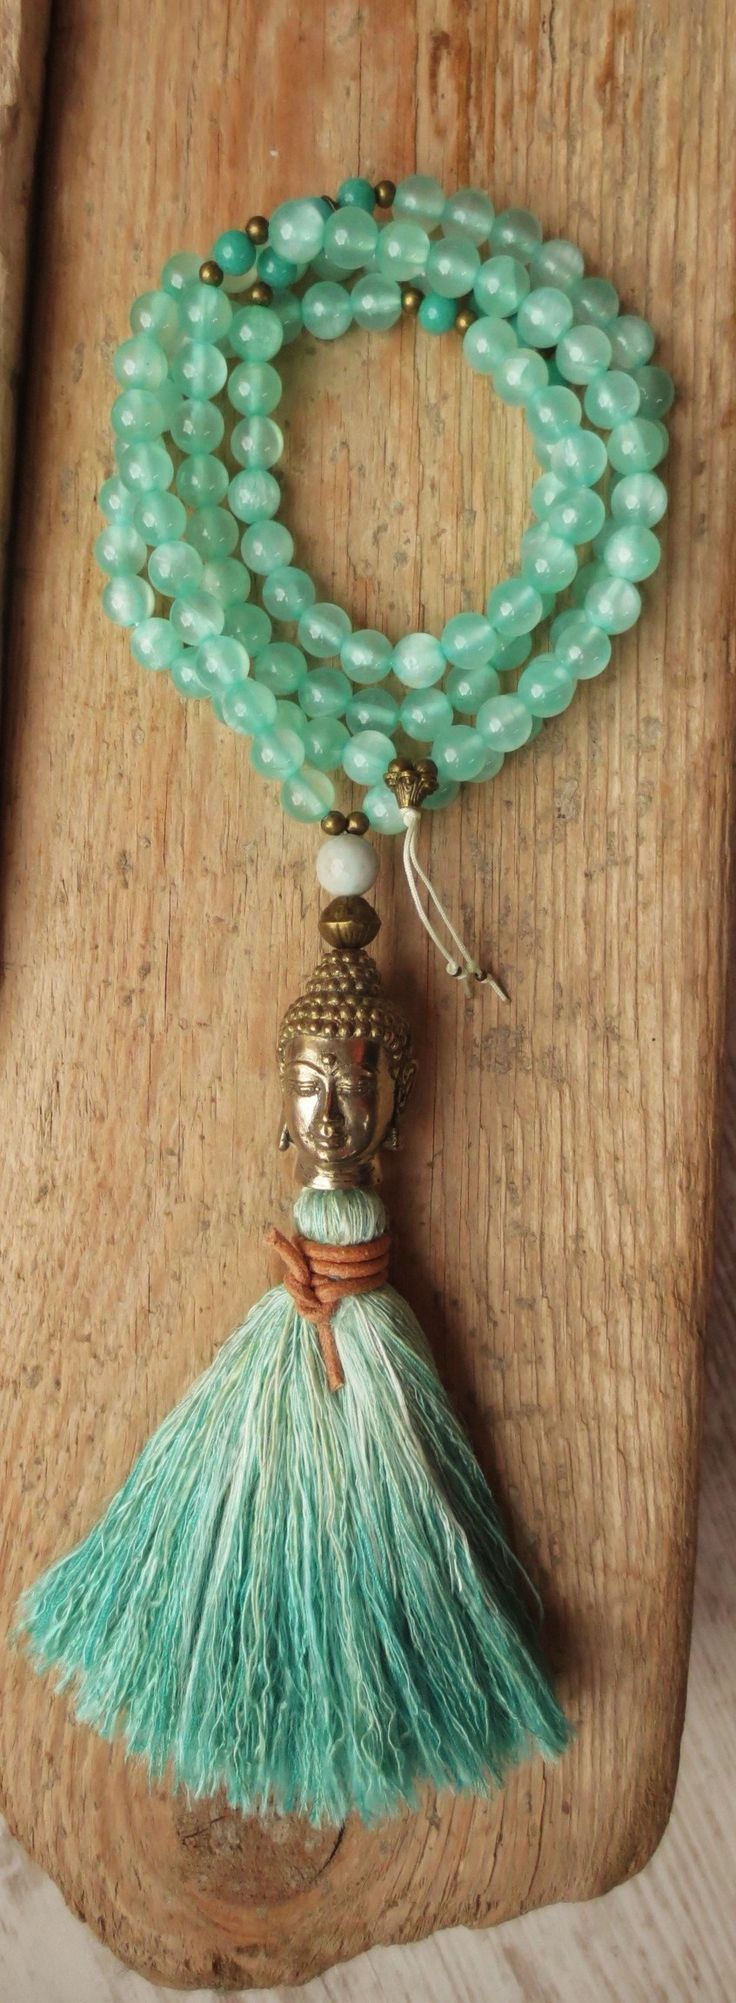 prayer beads necklace 108 mala Jade sea green Buddha brass handmande unique ooak yoga bali hippie love boho bohemian tribal turquoise